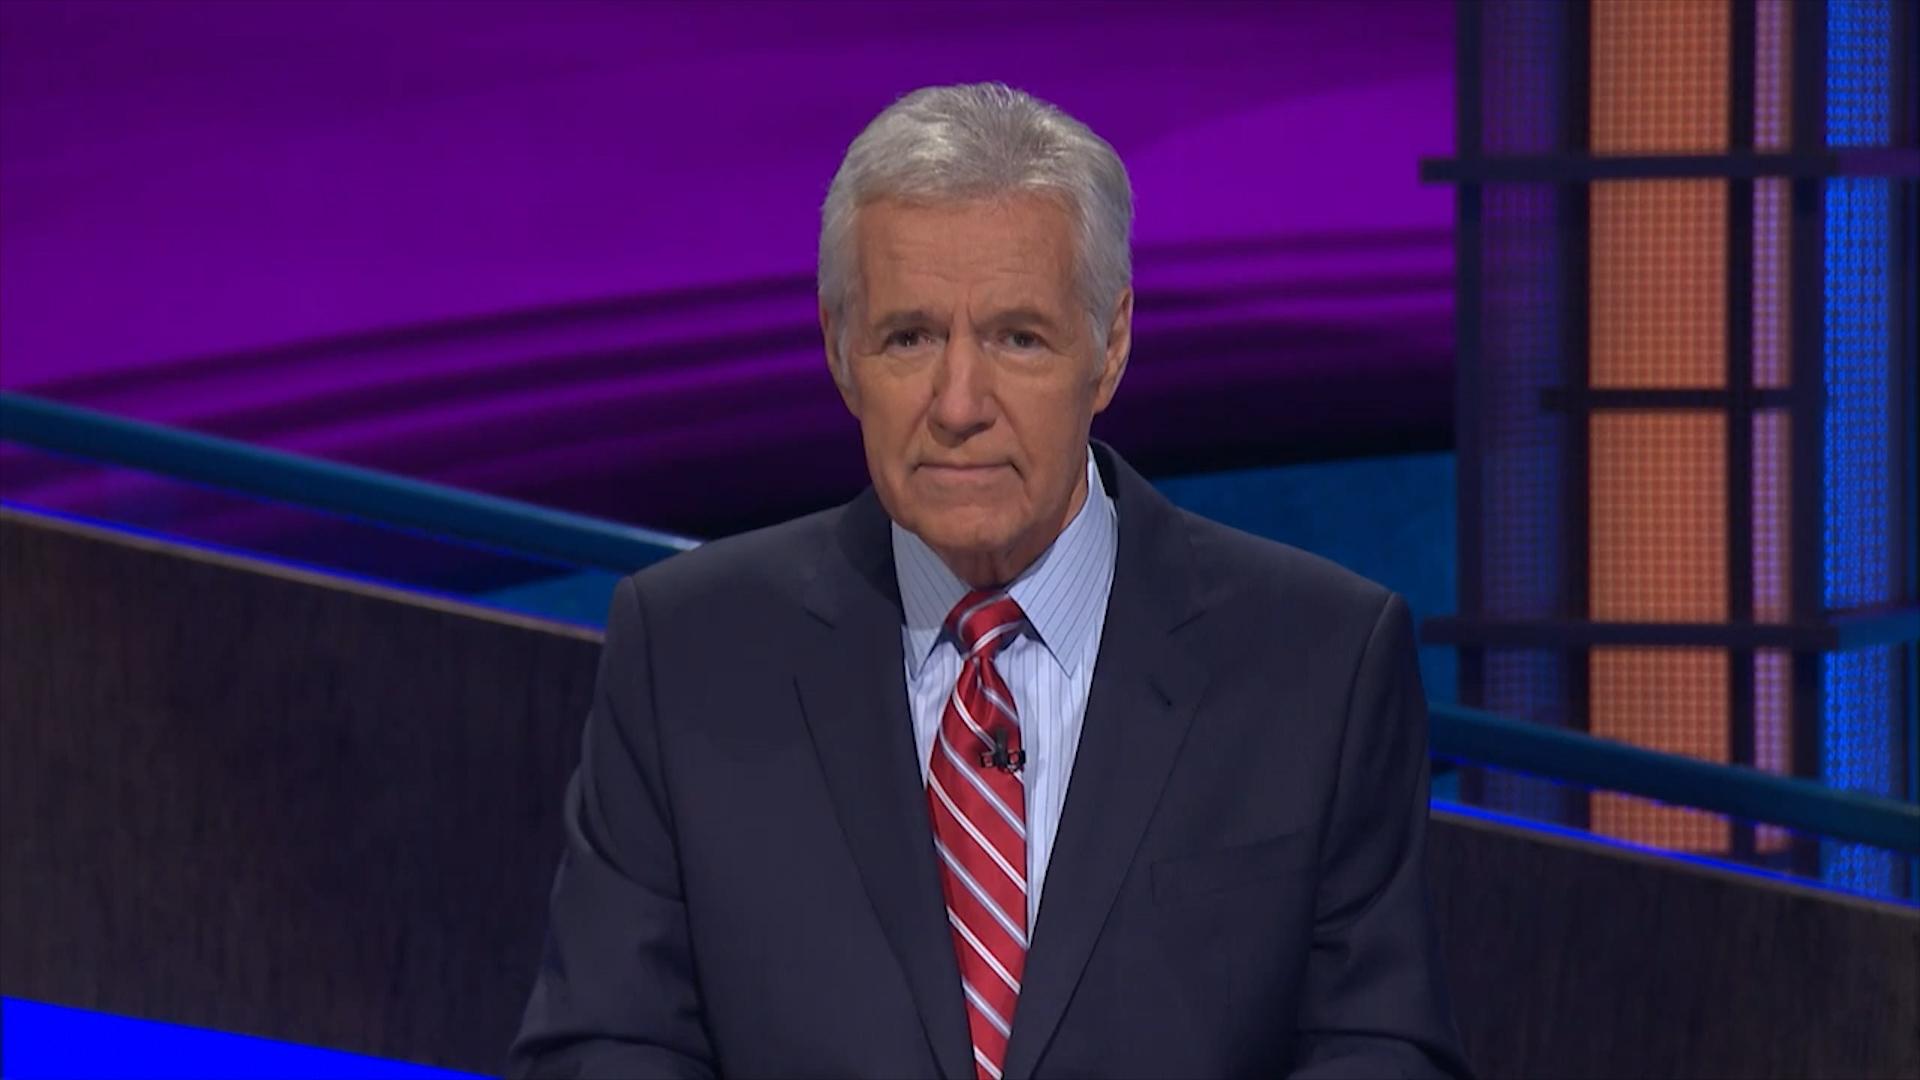 Alex Trebek, 'Jeopardy' host, reveals stage 4 pancreatic cancer diagnosis